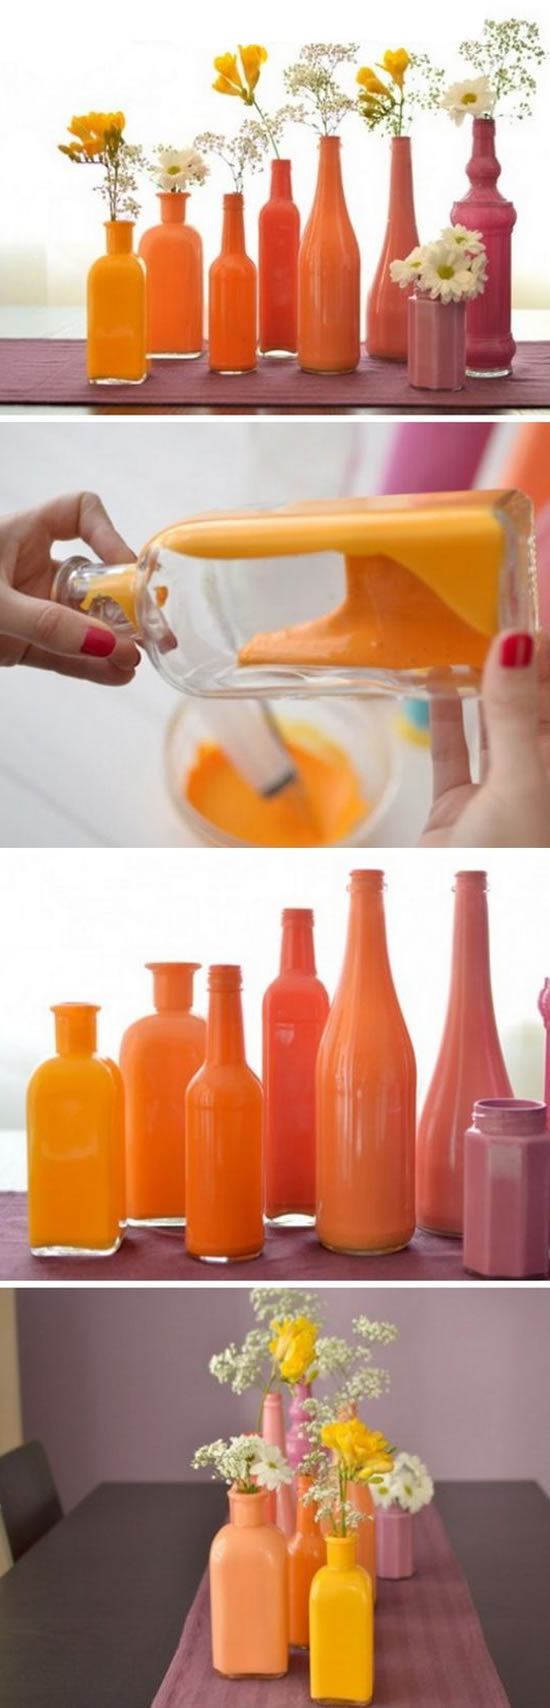 Vasinhos Coloridos com Garrafas de Vidro